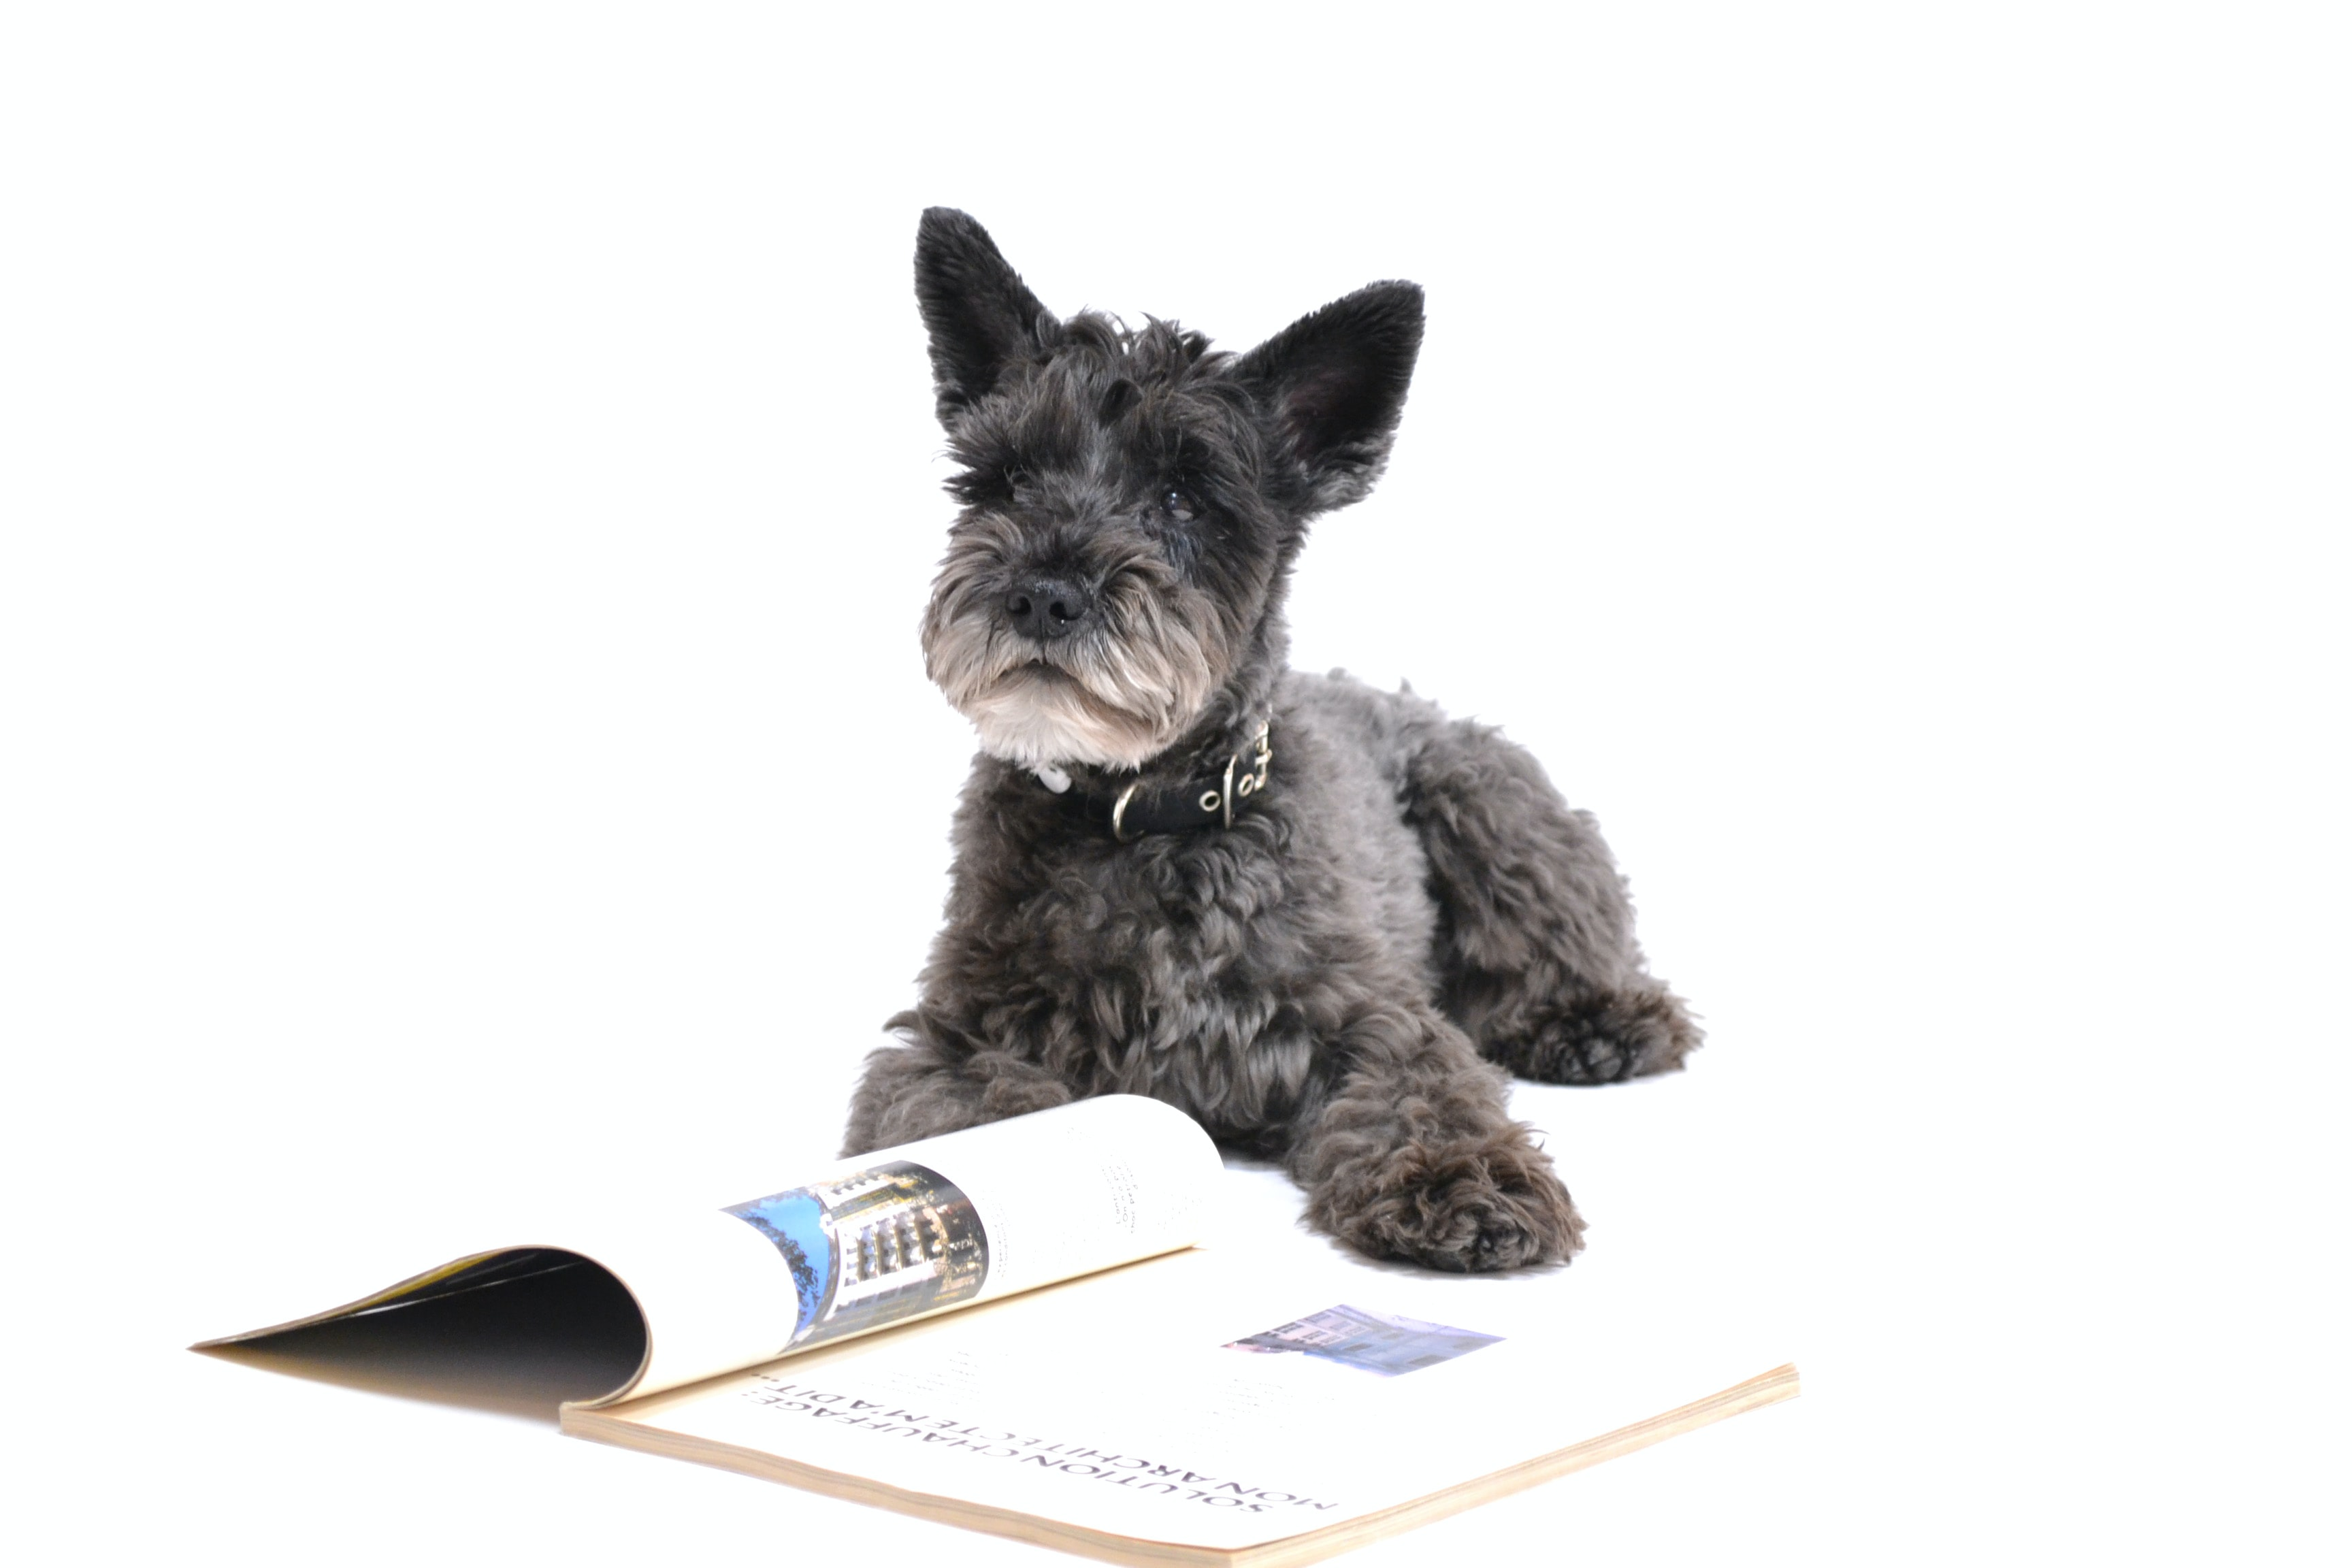 long-coated gray dog